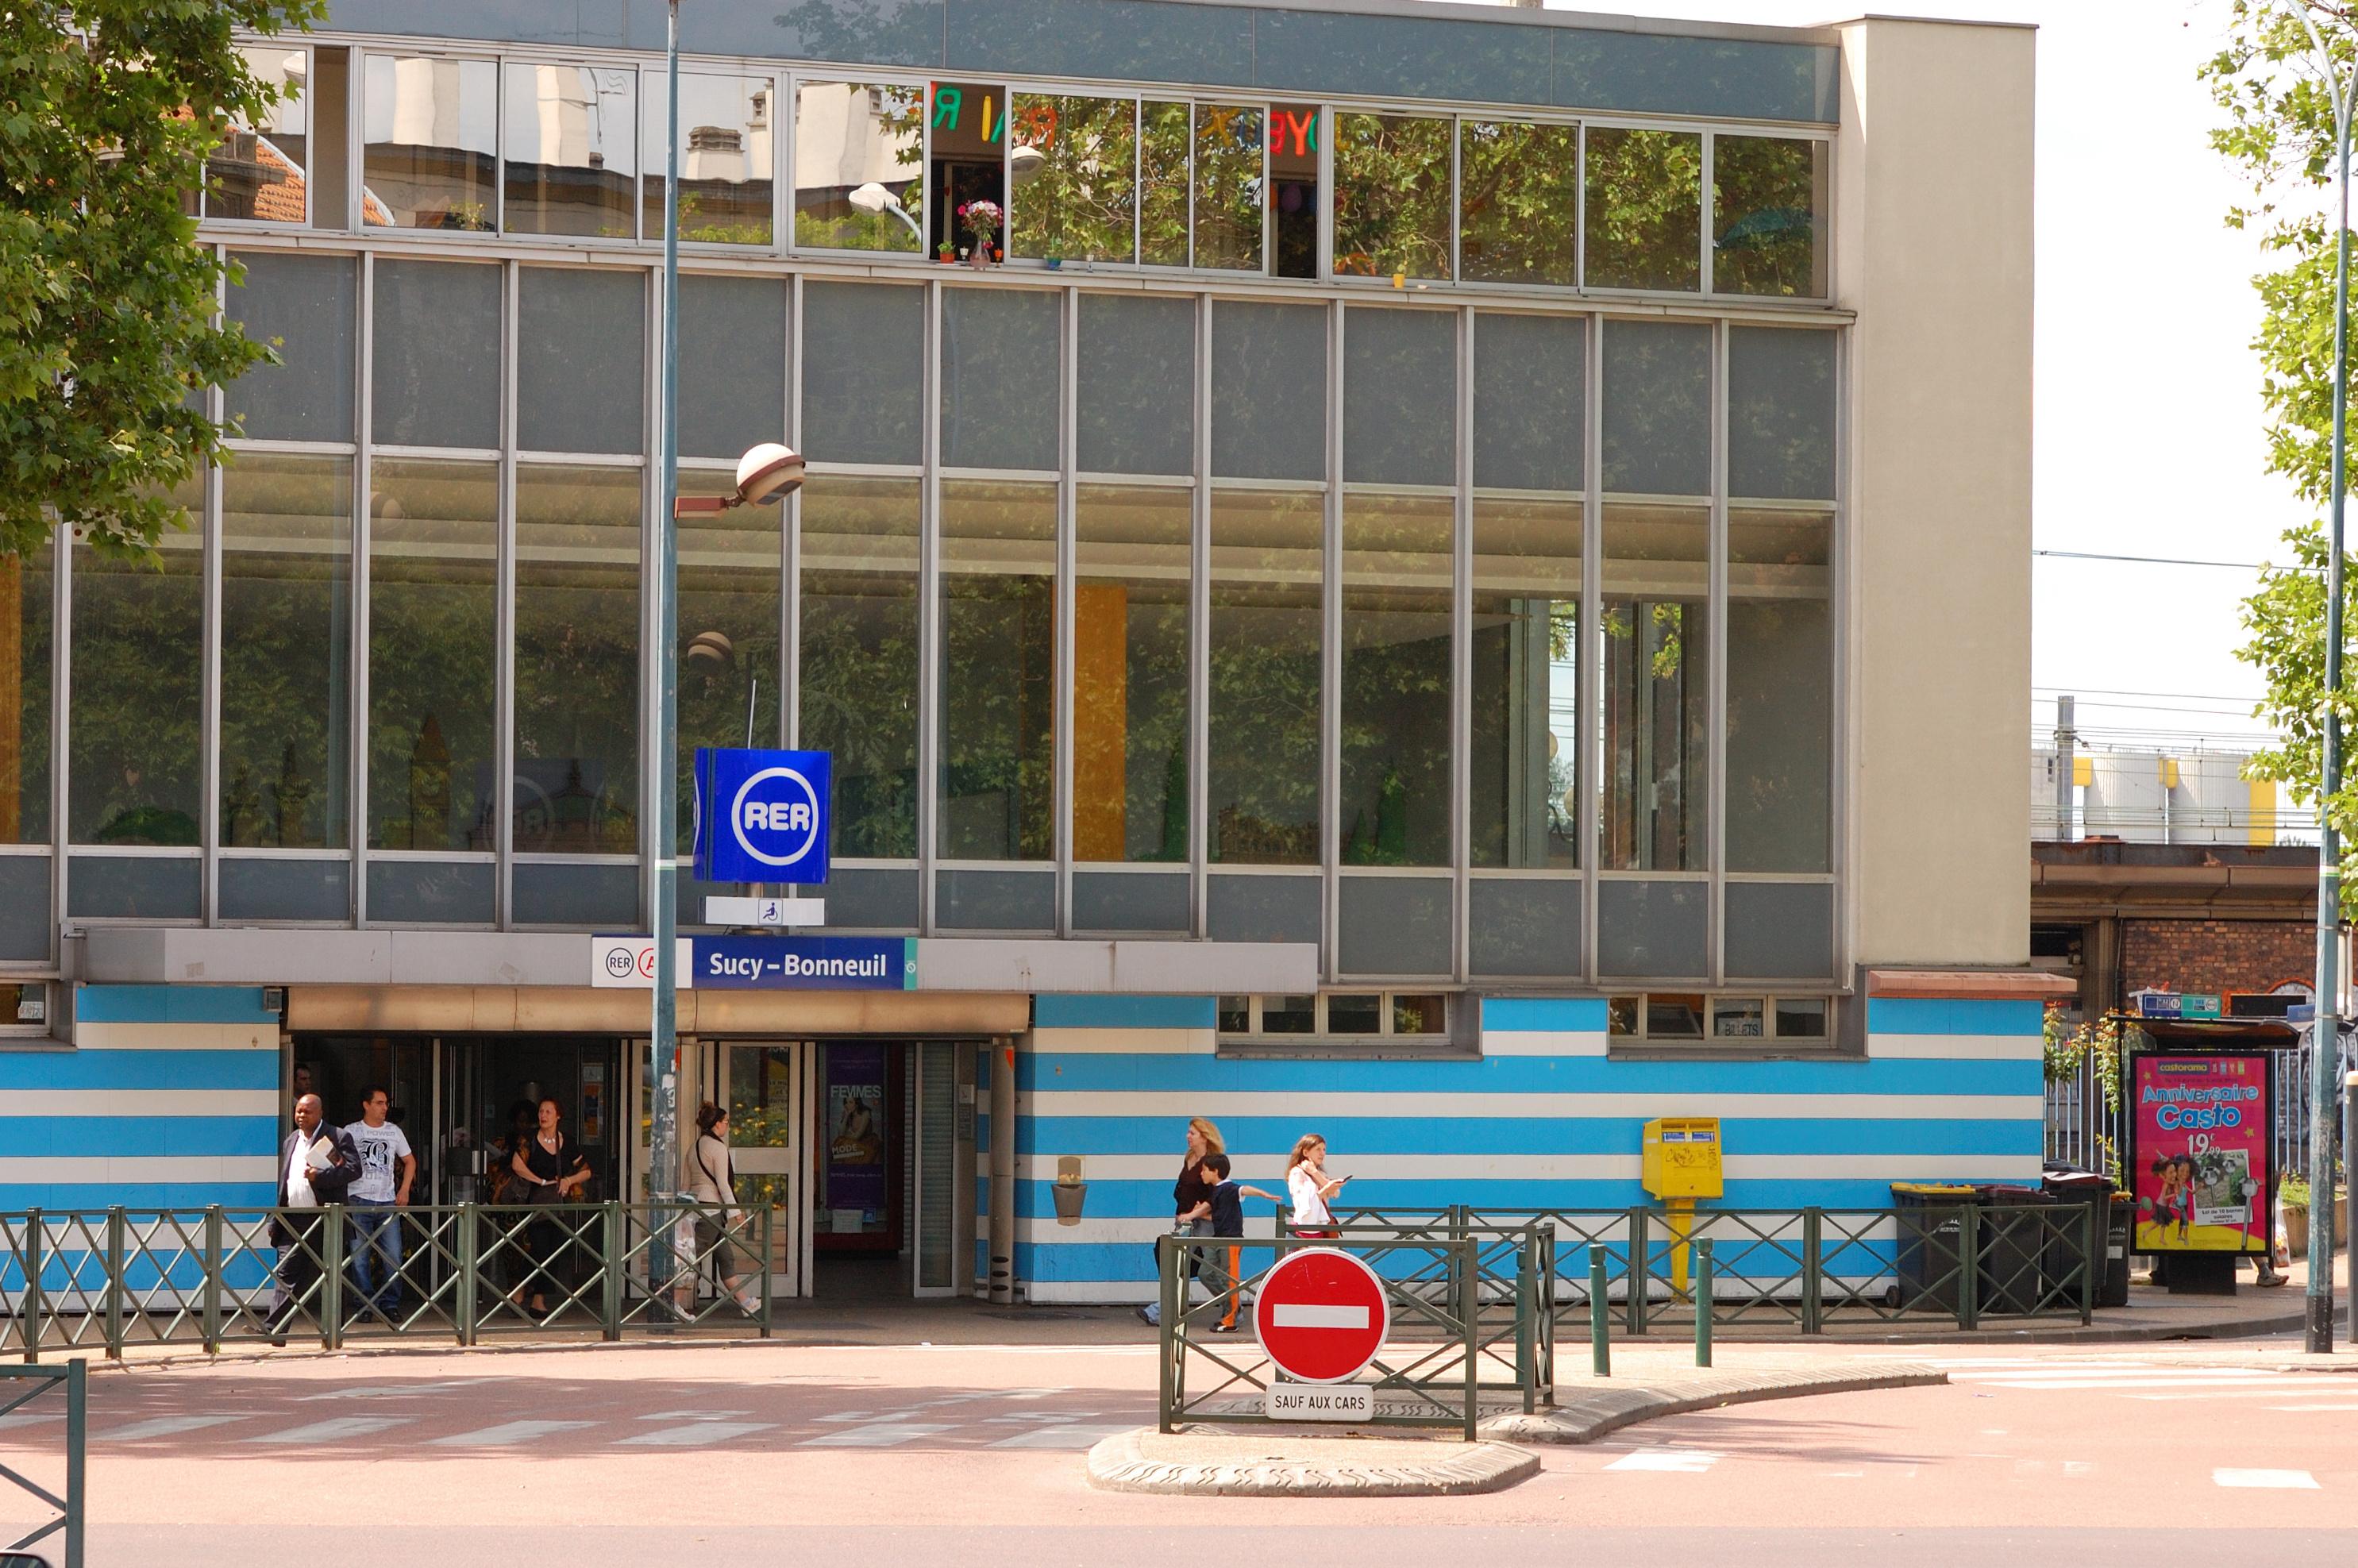 Gare de sucy bonneuil wikiwand for Appartement atypique sucy en brie